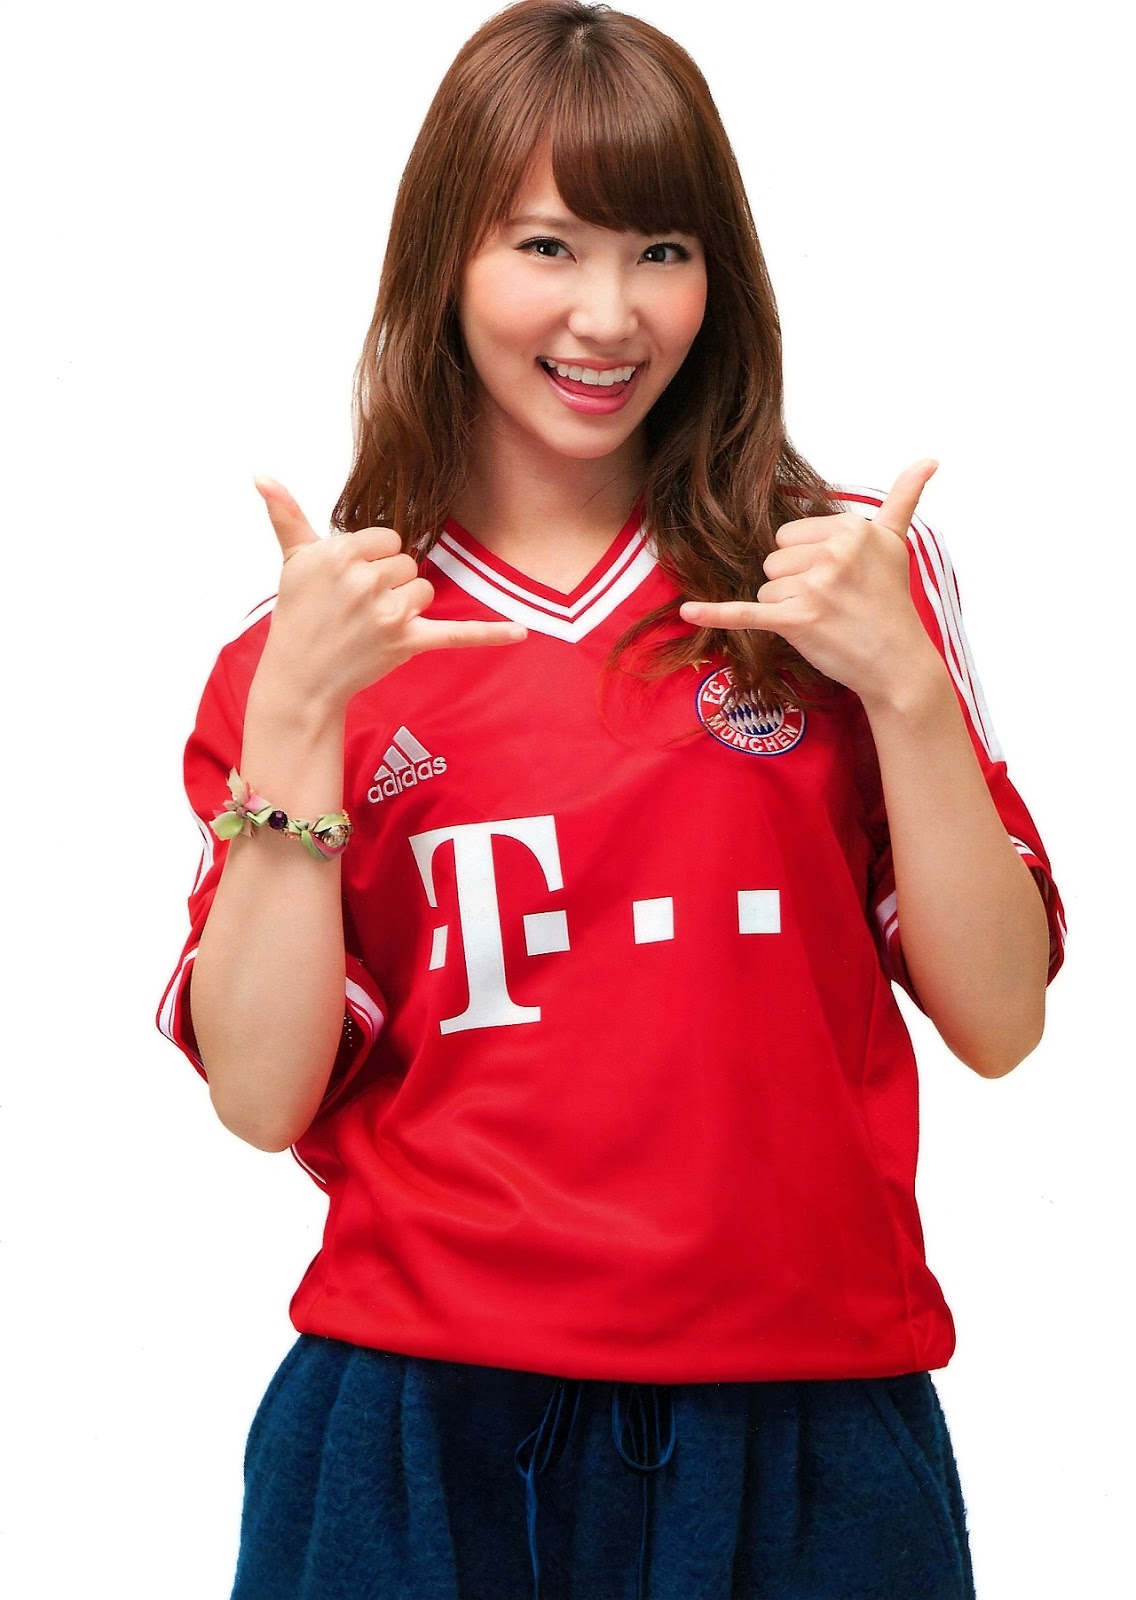 Photos Videos News: AKB48 Mariya Nagao